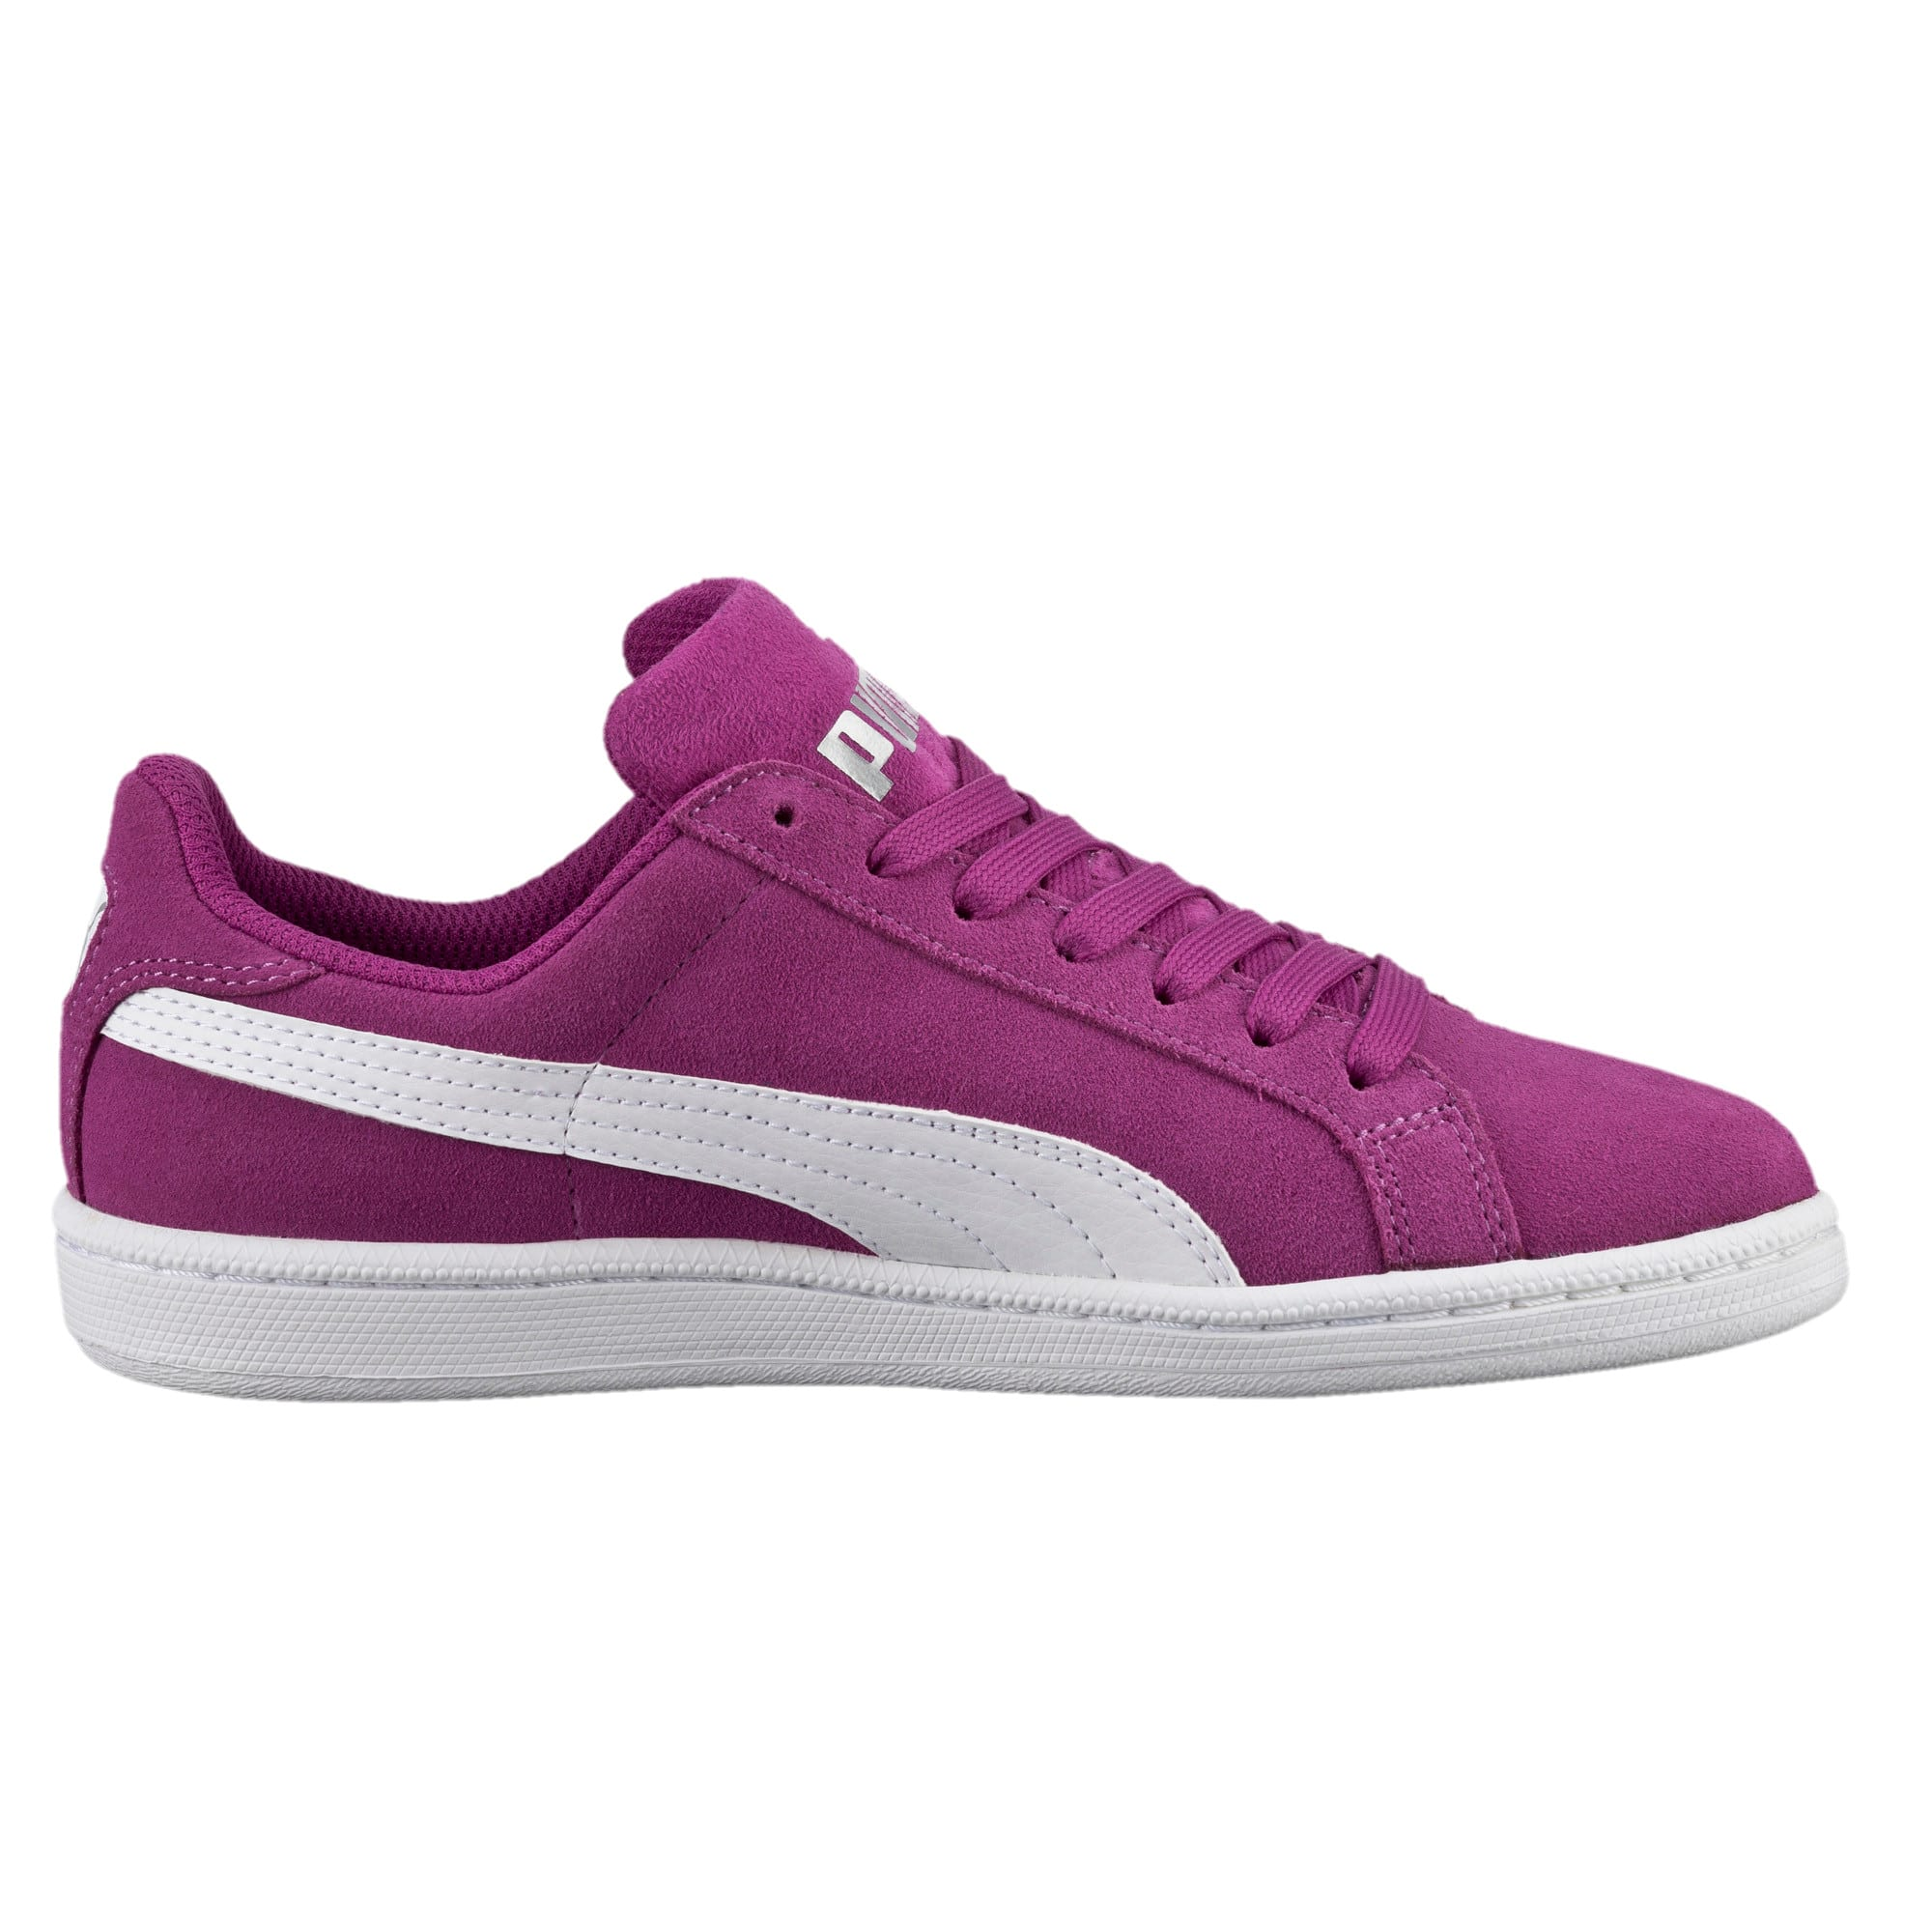 Thumbnail 3 of Smash Suede Sneakers JR, Hollyhock-Puma White, medium